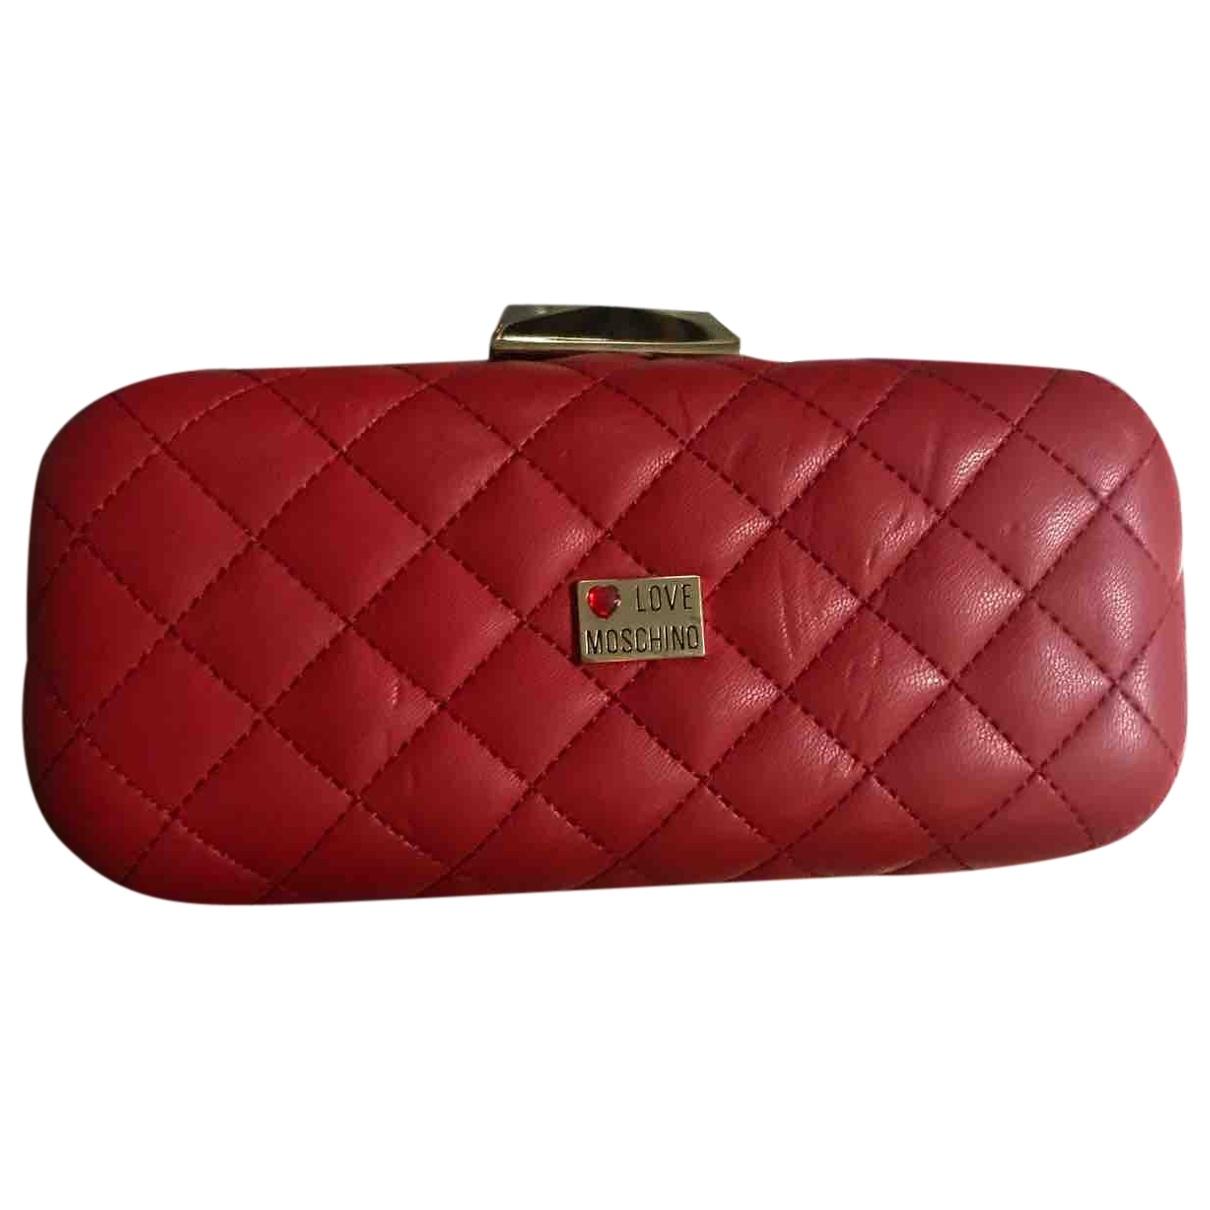 Moschino Love \N Red Clutch bag for Women \N